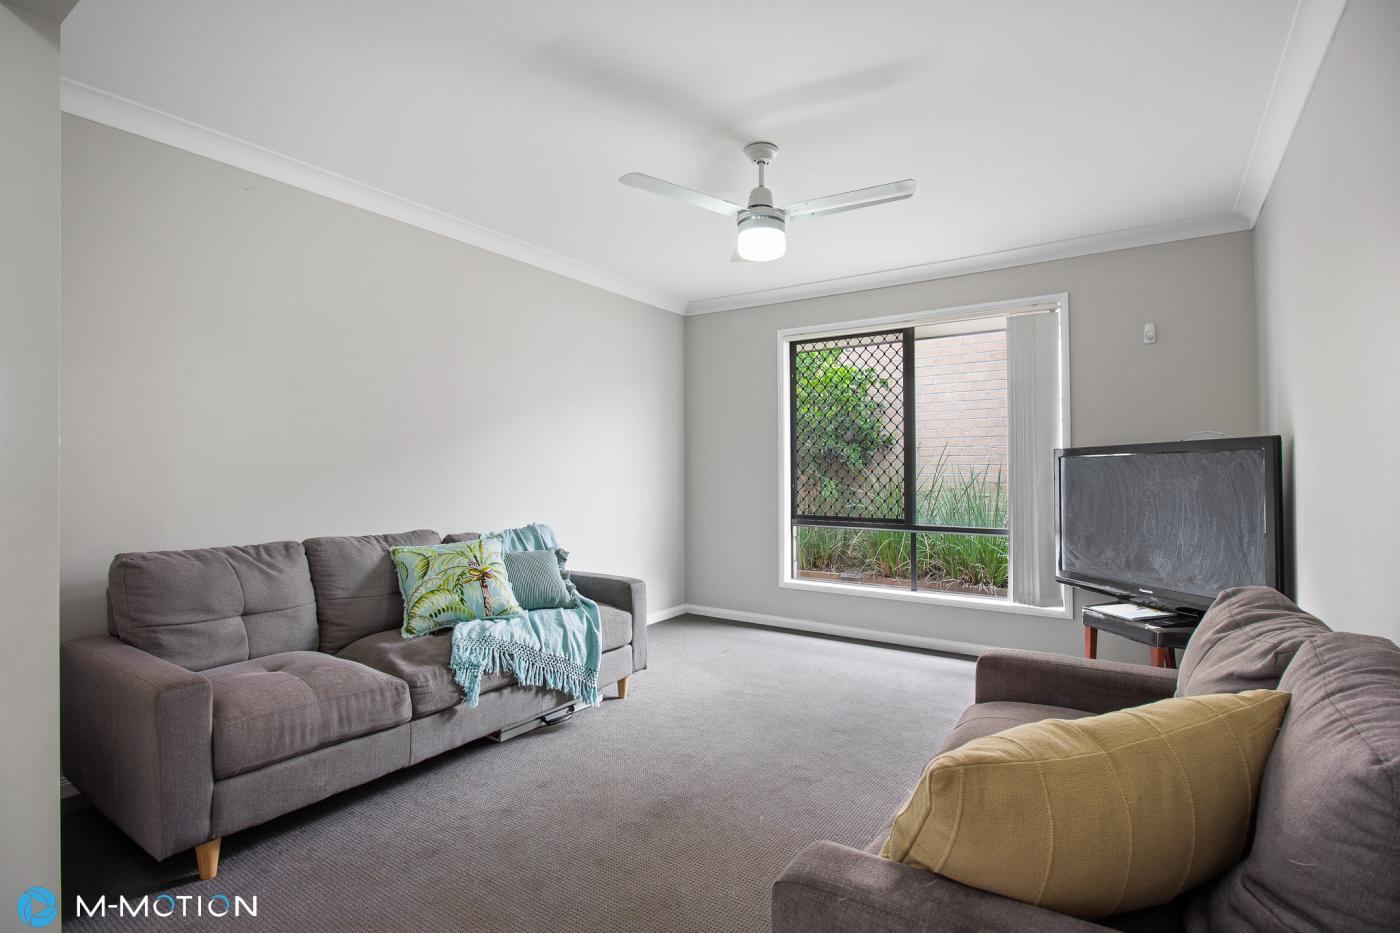 M-Motion Real Estate Agency, 14 Moogerah Boulevard, Redbank Plains, Qld 4301, Kellie Bennett Best Real Estate Agent Gold Coast